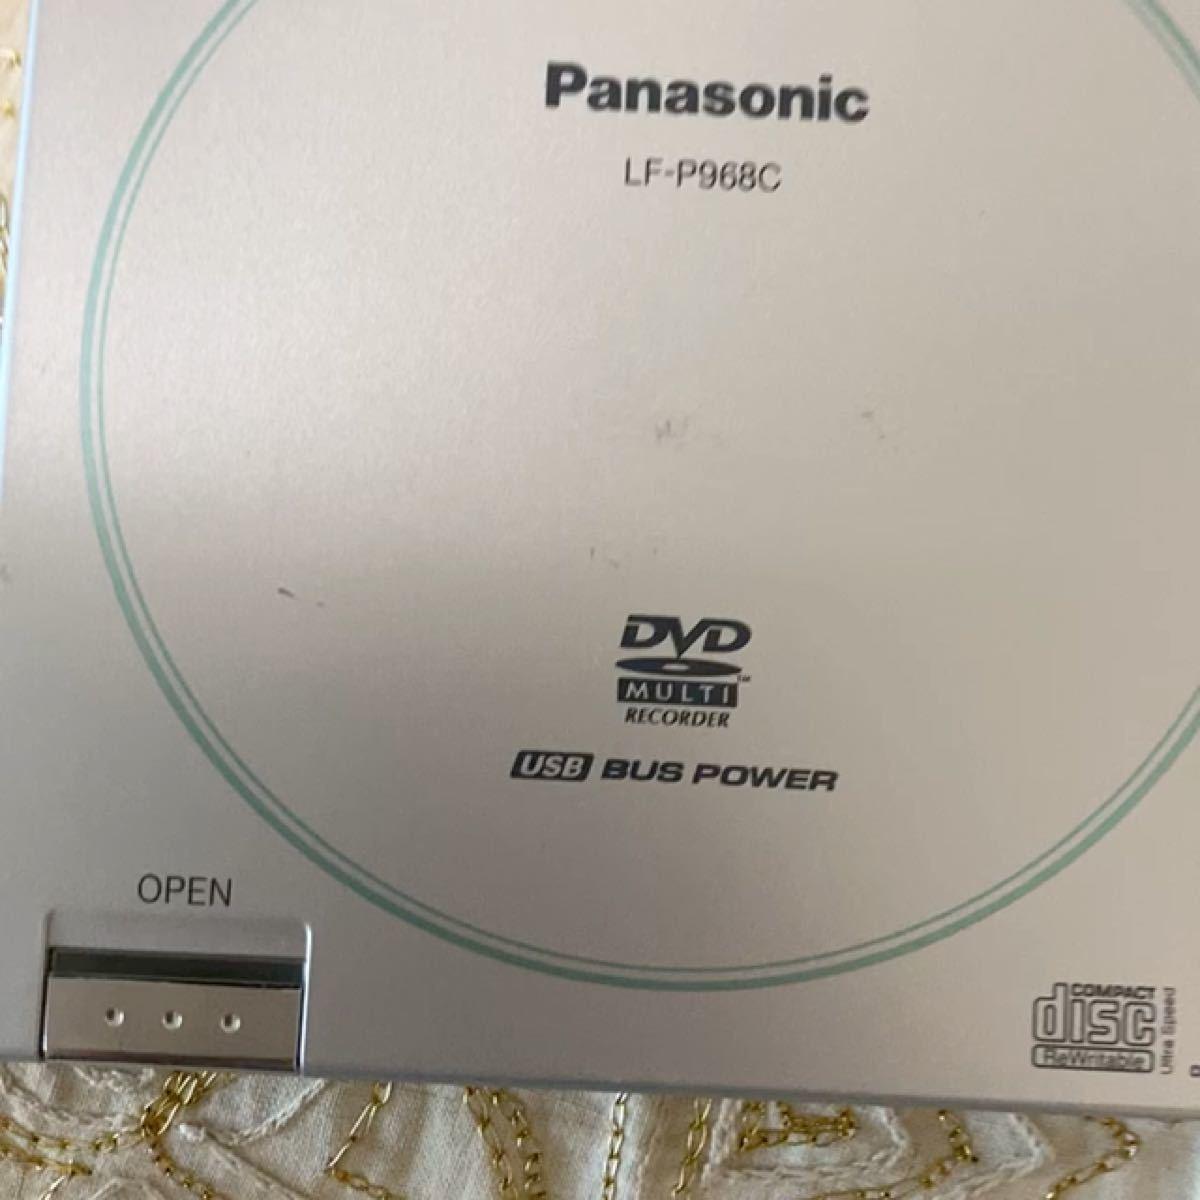 Panasonic 外付け ポータブルDVD DVDマルチドライブ パナソニック LF-P968C USB 動作品 使用感あり